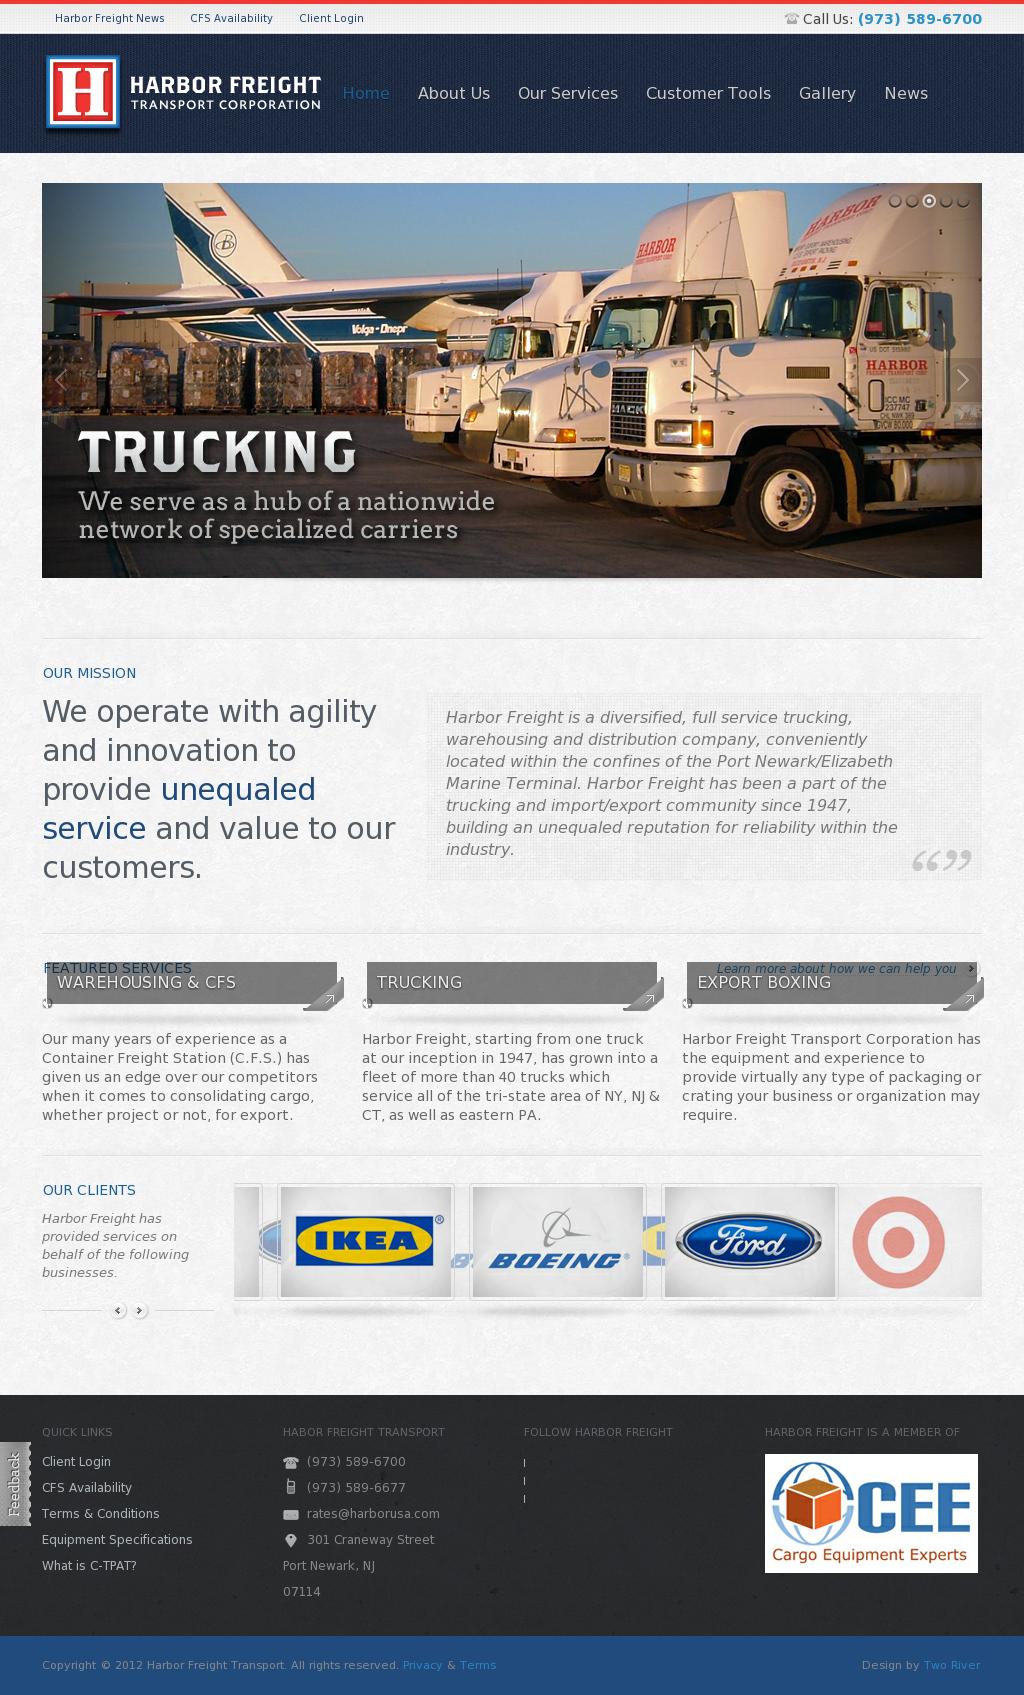 Harbor Freight Company Profile | Owler